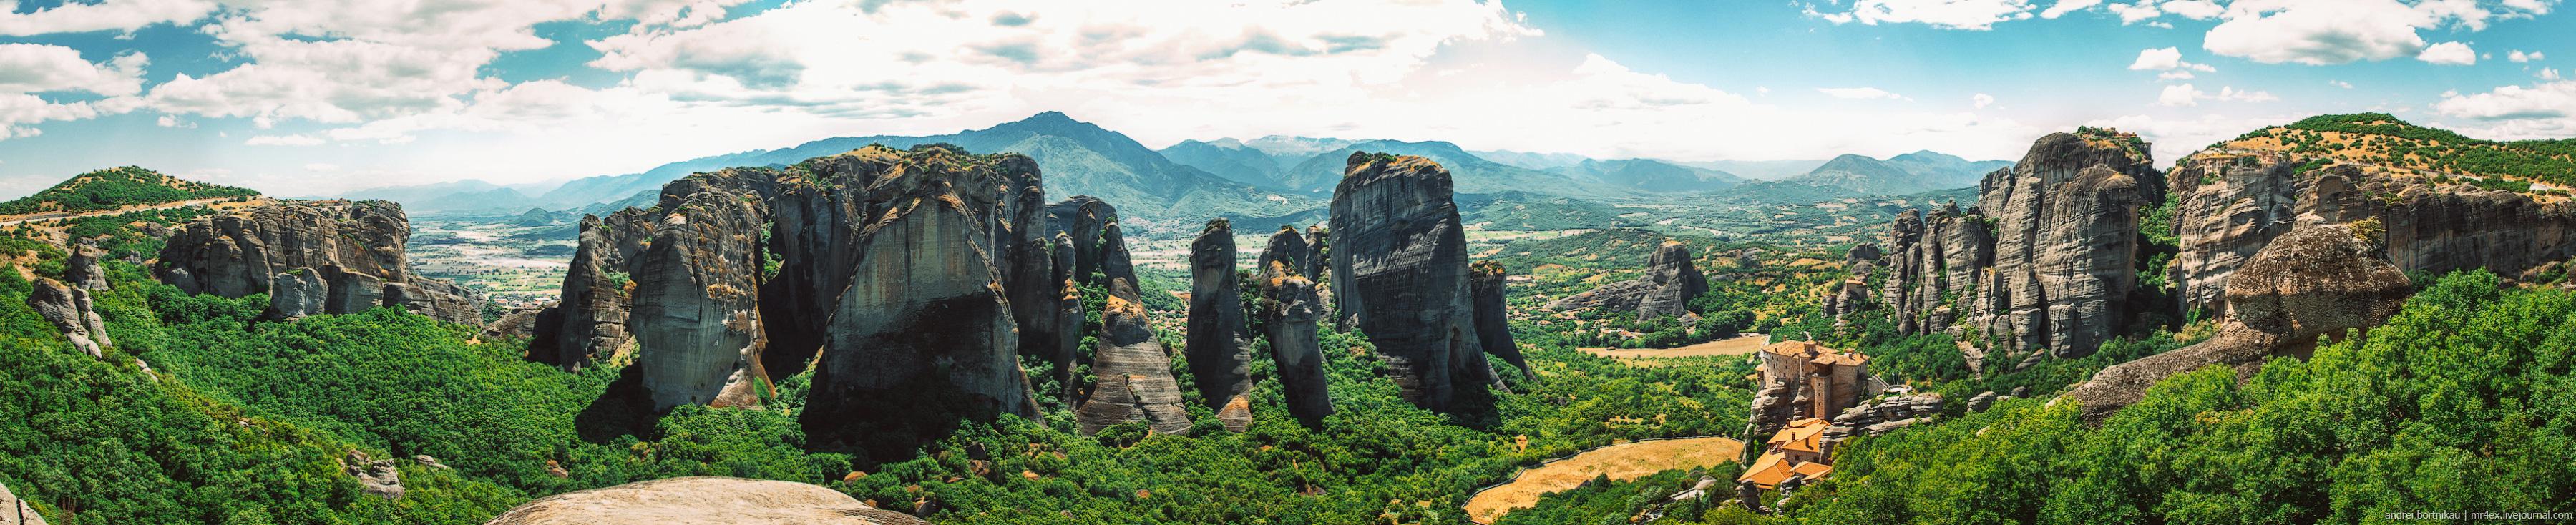 Панорома, Каламбака, Греция, Метеоры